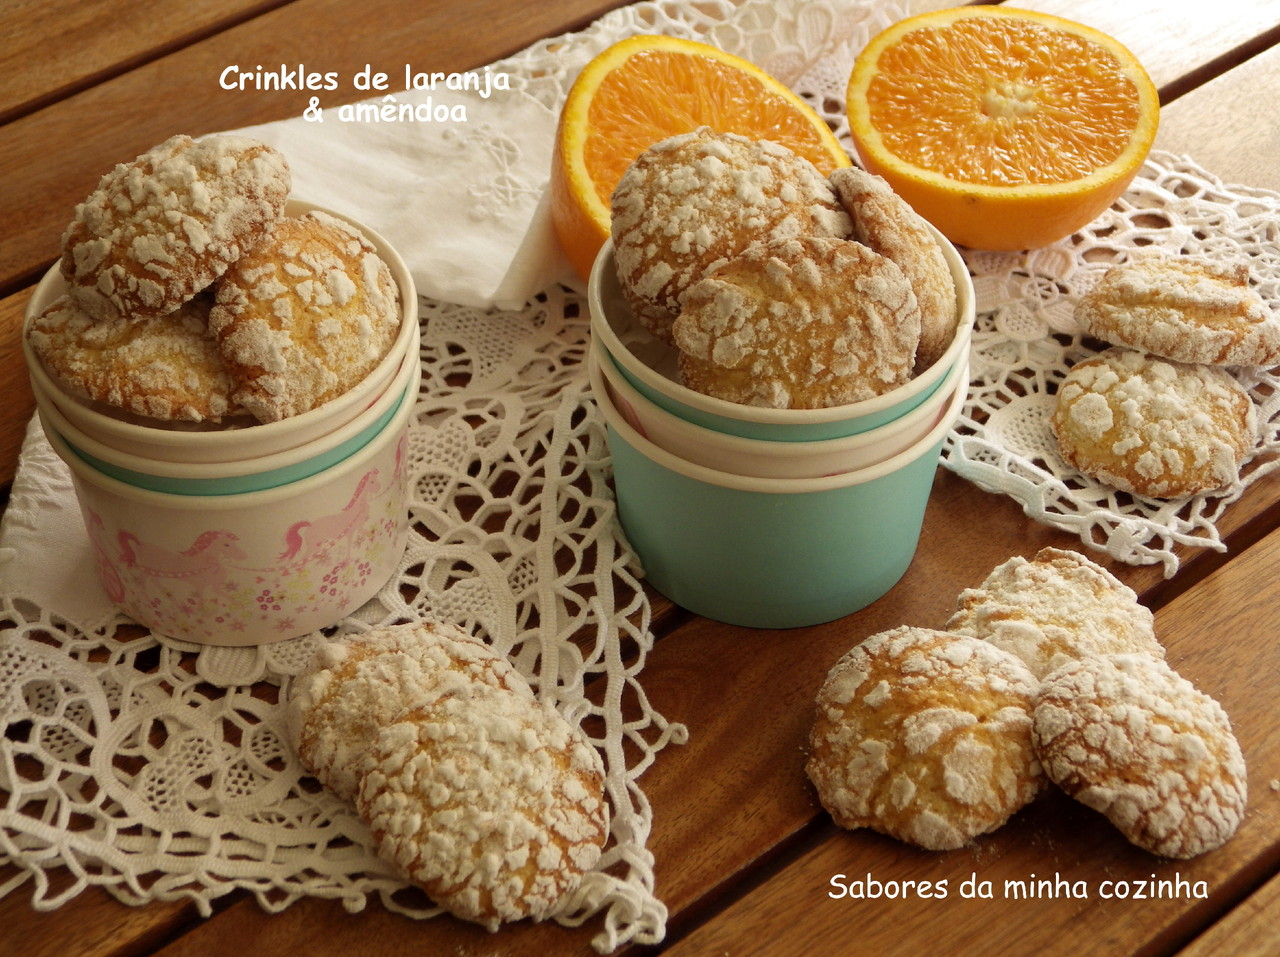 IMGP6312-Crinkles de laranja & amêndoa-Blog.JPG